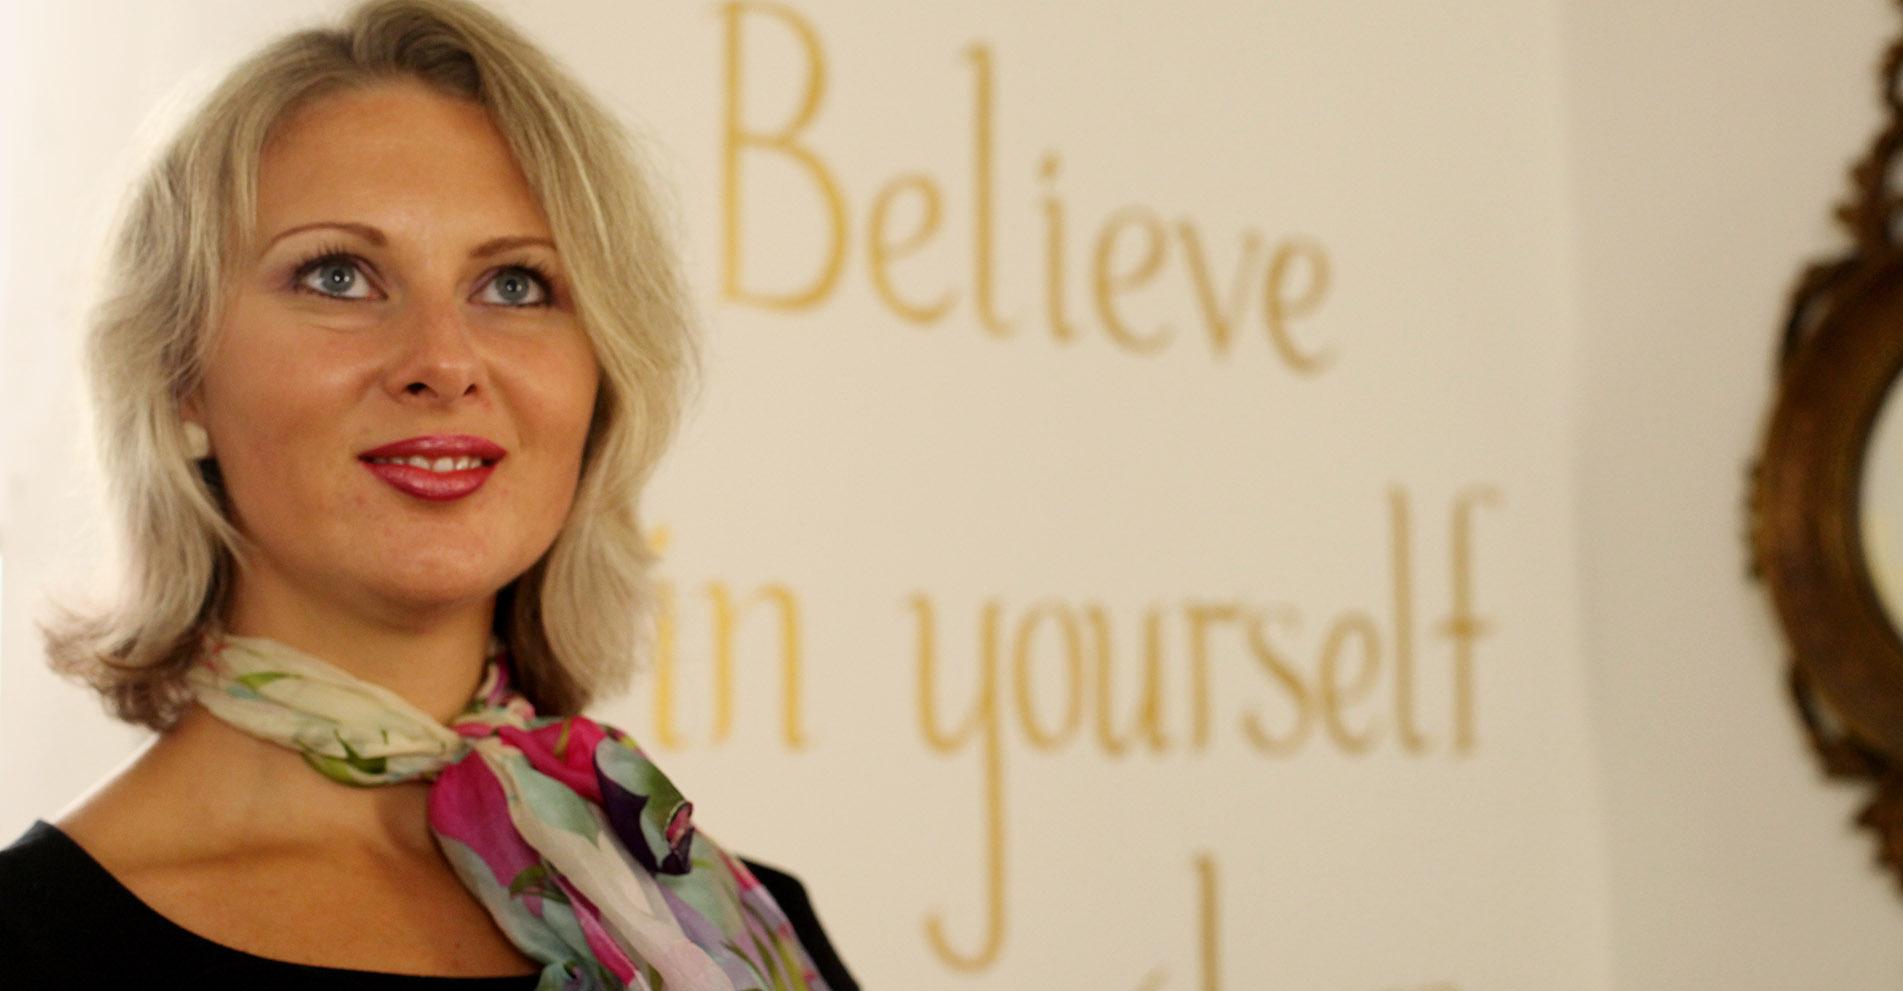 Lucia Believe - Lucia Hoxha   Yoga   Lifestyle Coach   Online Yoga for Women